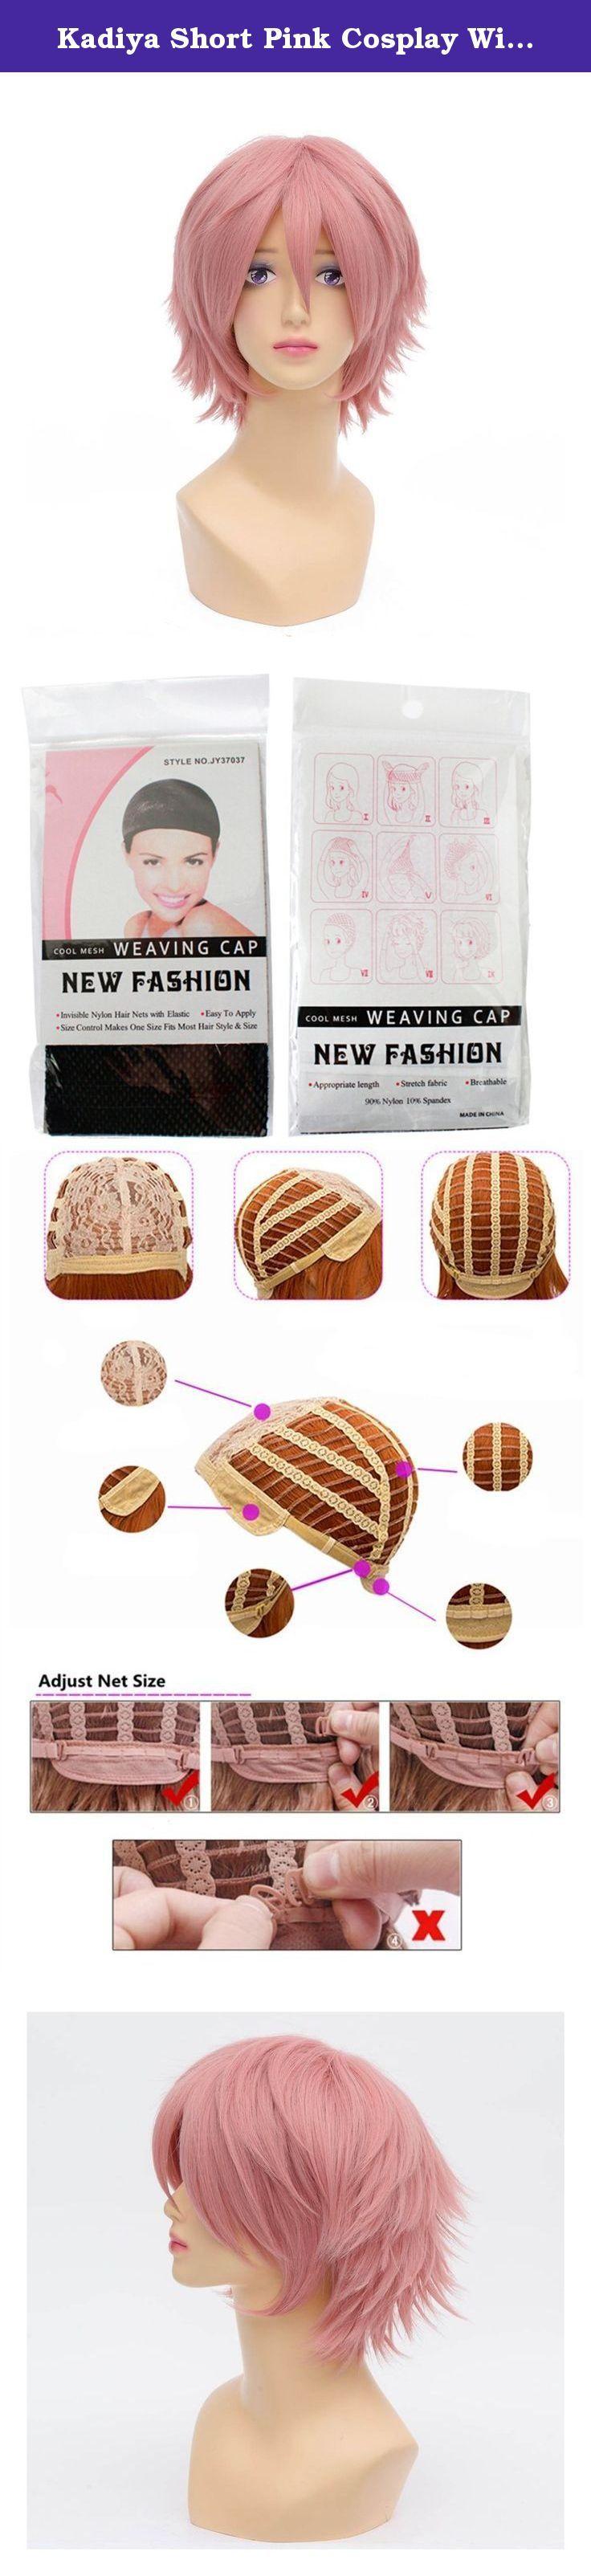 Kadiya Short Pink Cosplay Wig Costume Synthetic Hair Unisex. High Quality Cosplay Costume Wigs.